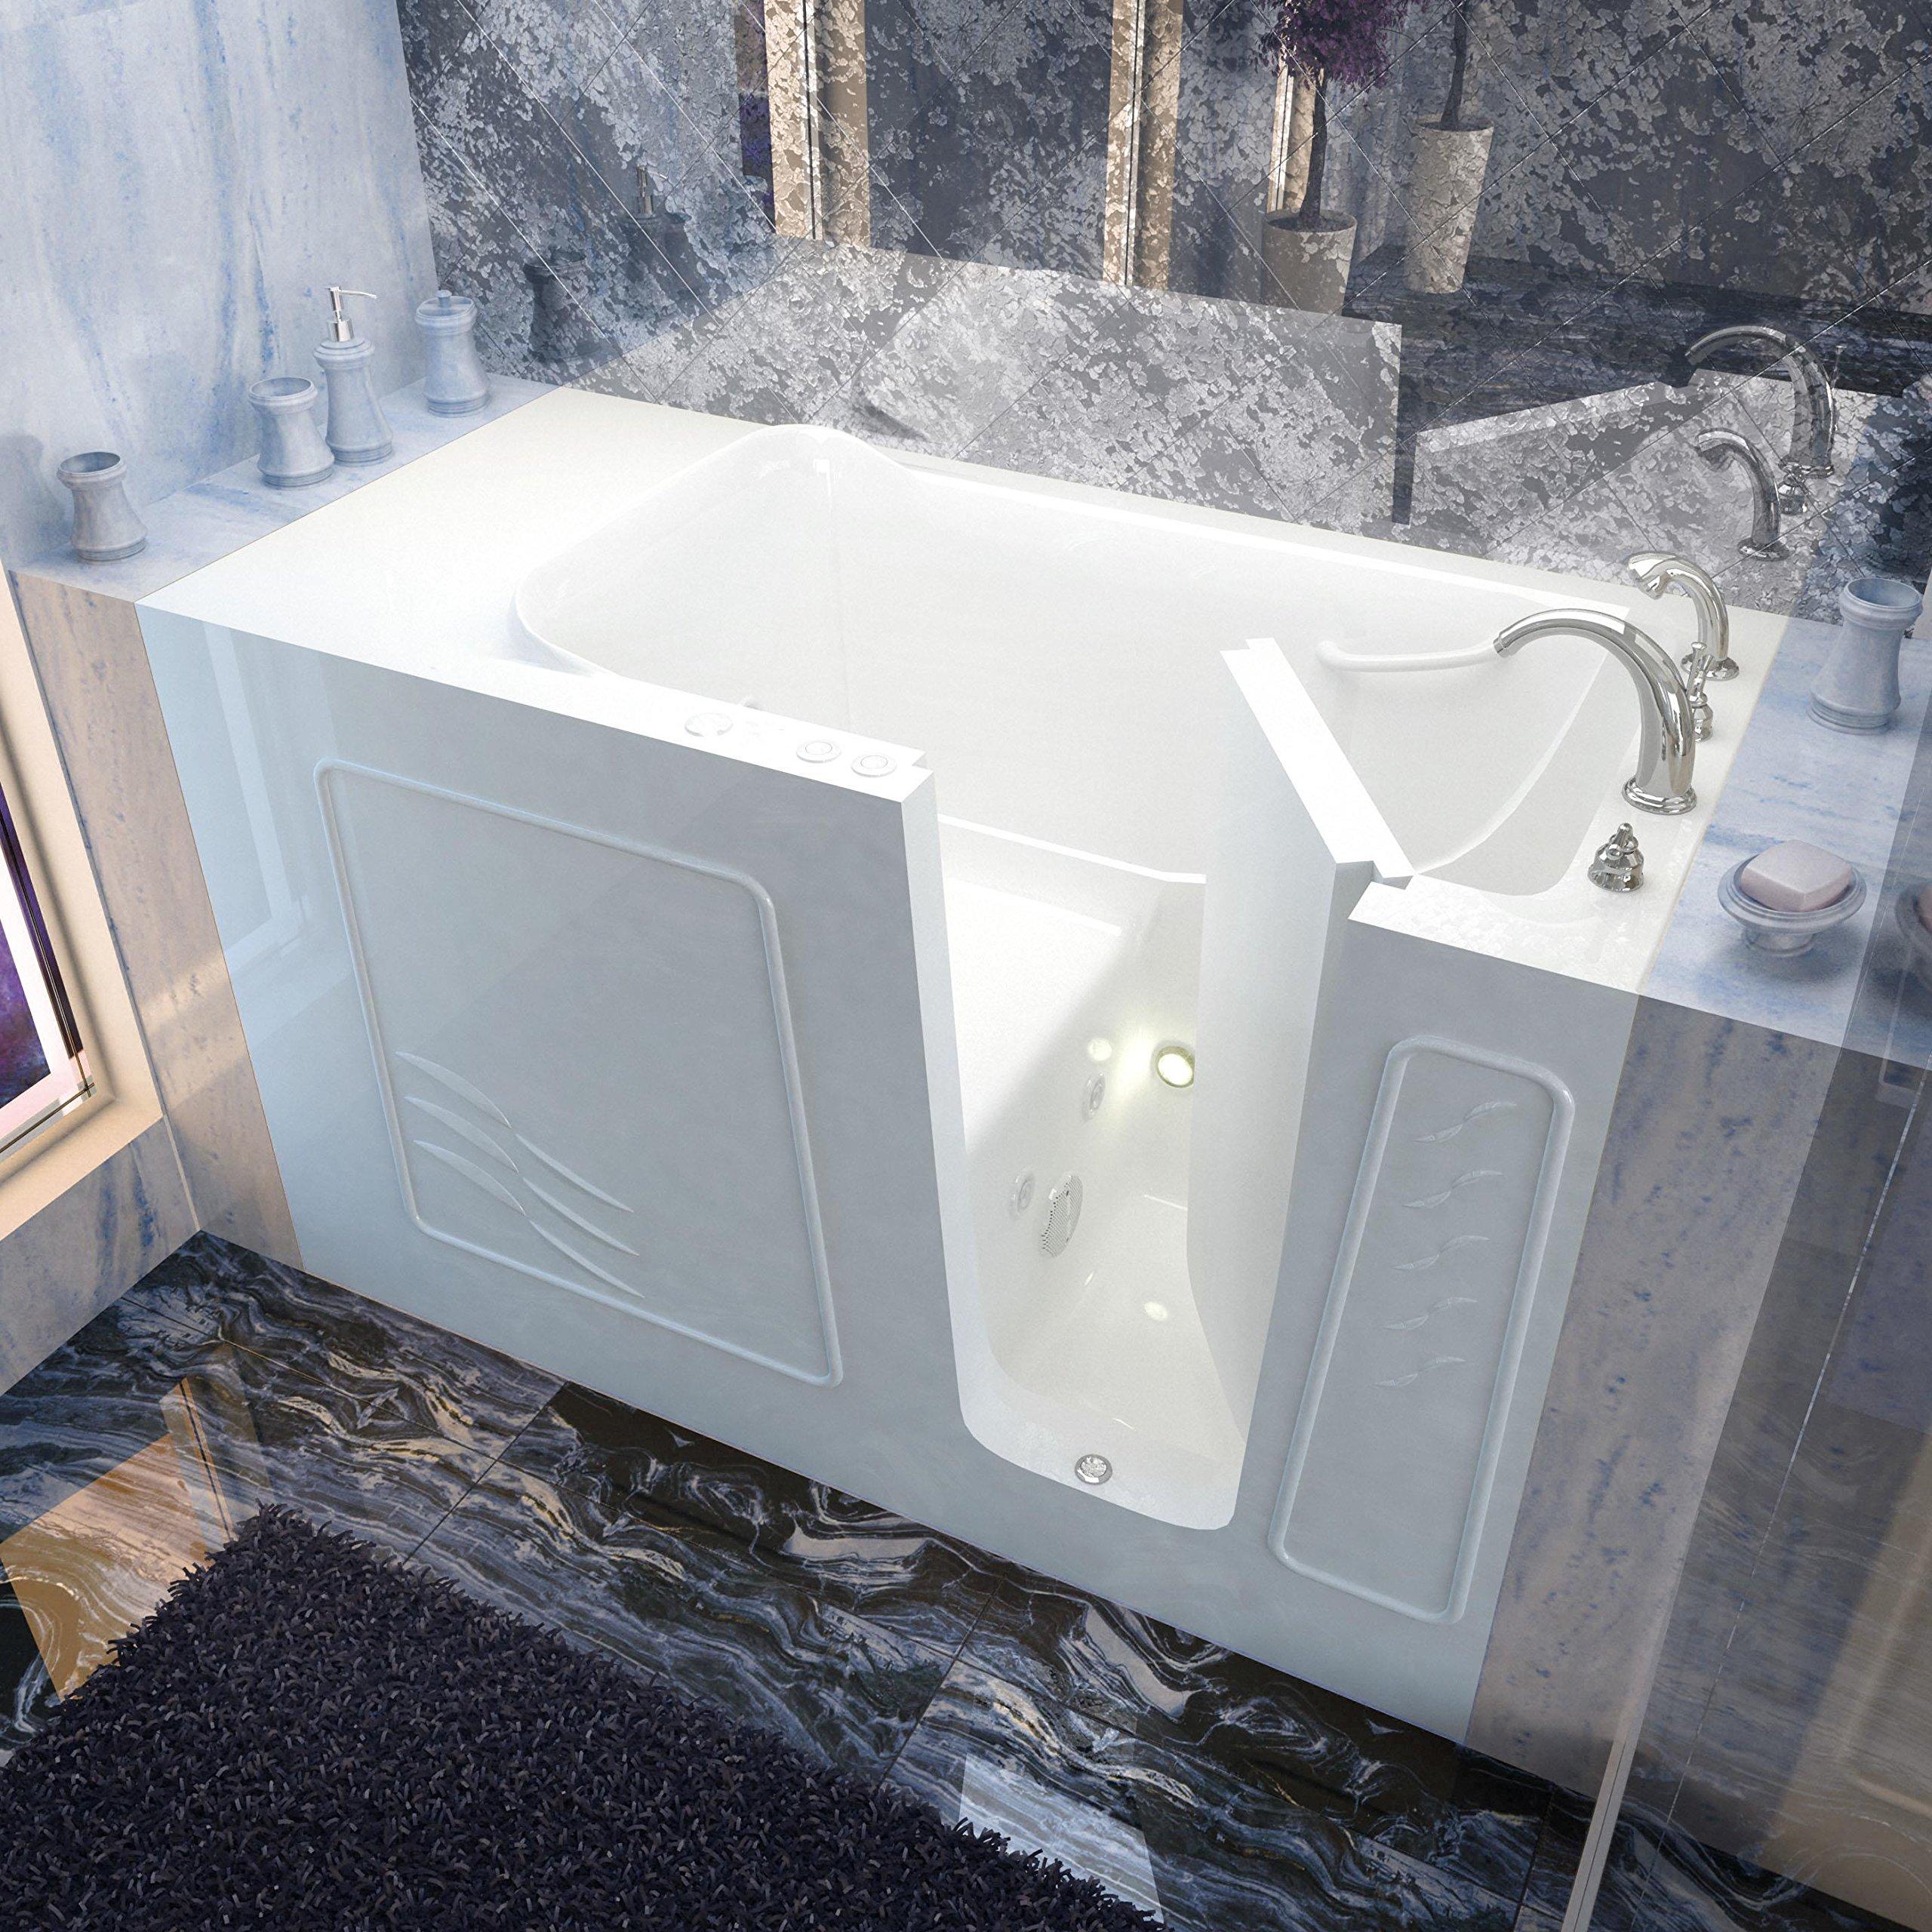 Spa World Venzi Vz3060wirwh Rectangular Whirlpool Walk-In Bathtub, 30x60, Right Drain, White